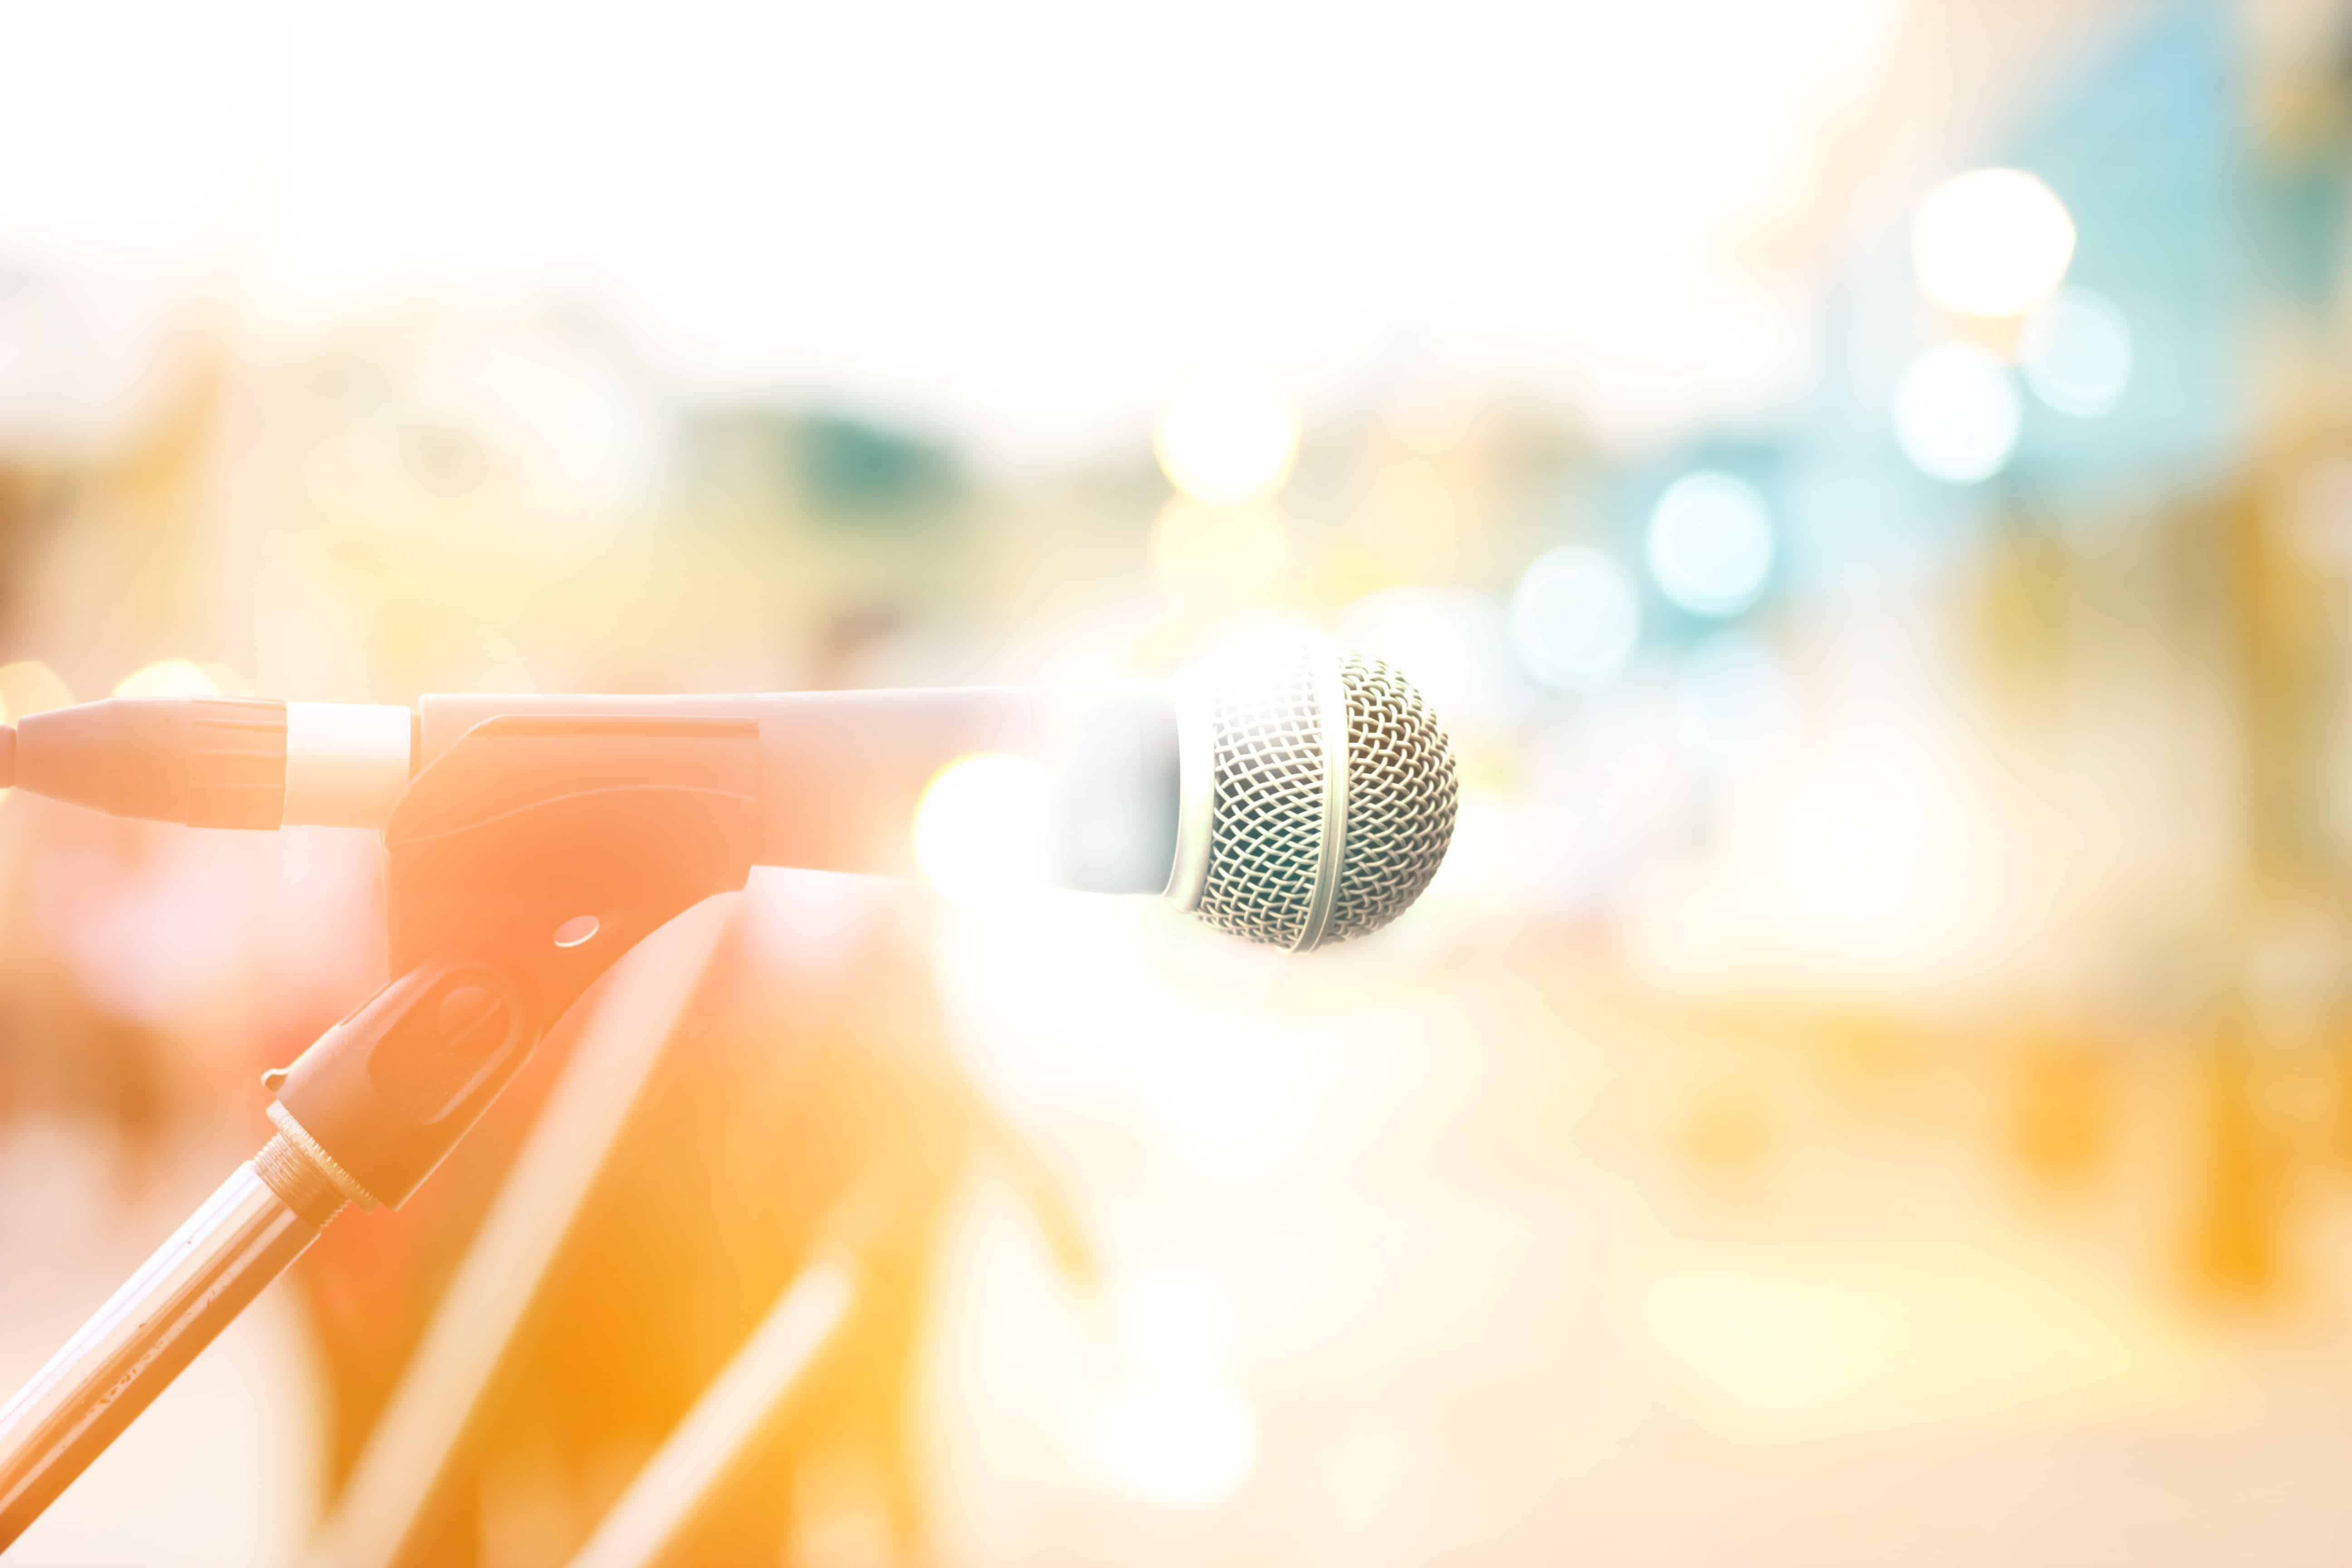 Beste microfoon voor podcasting, webinars en video